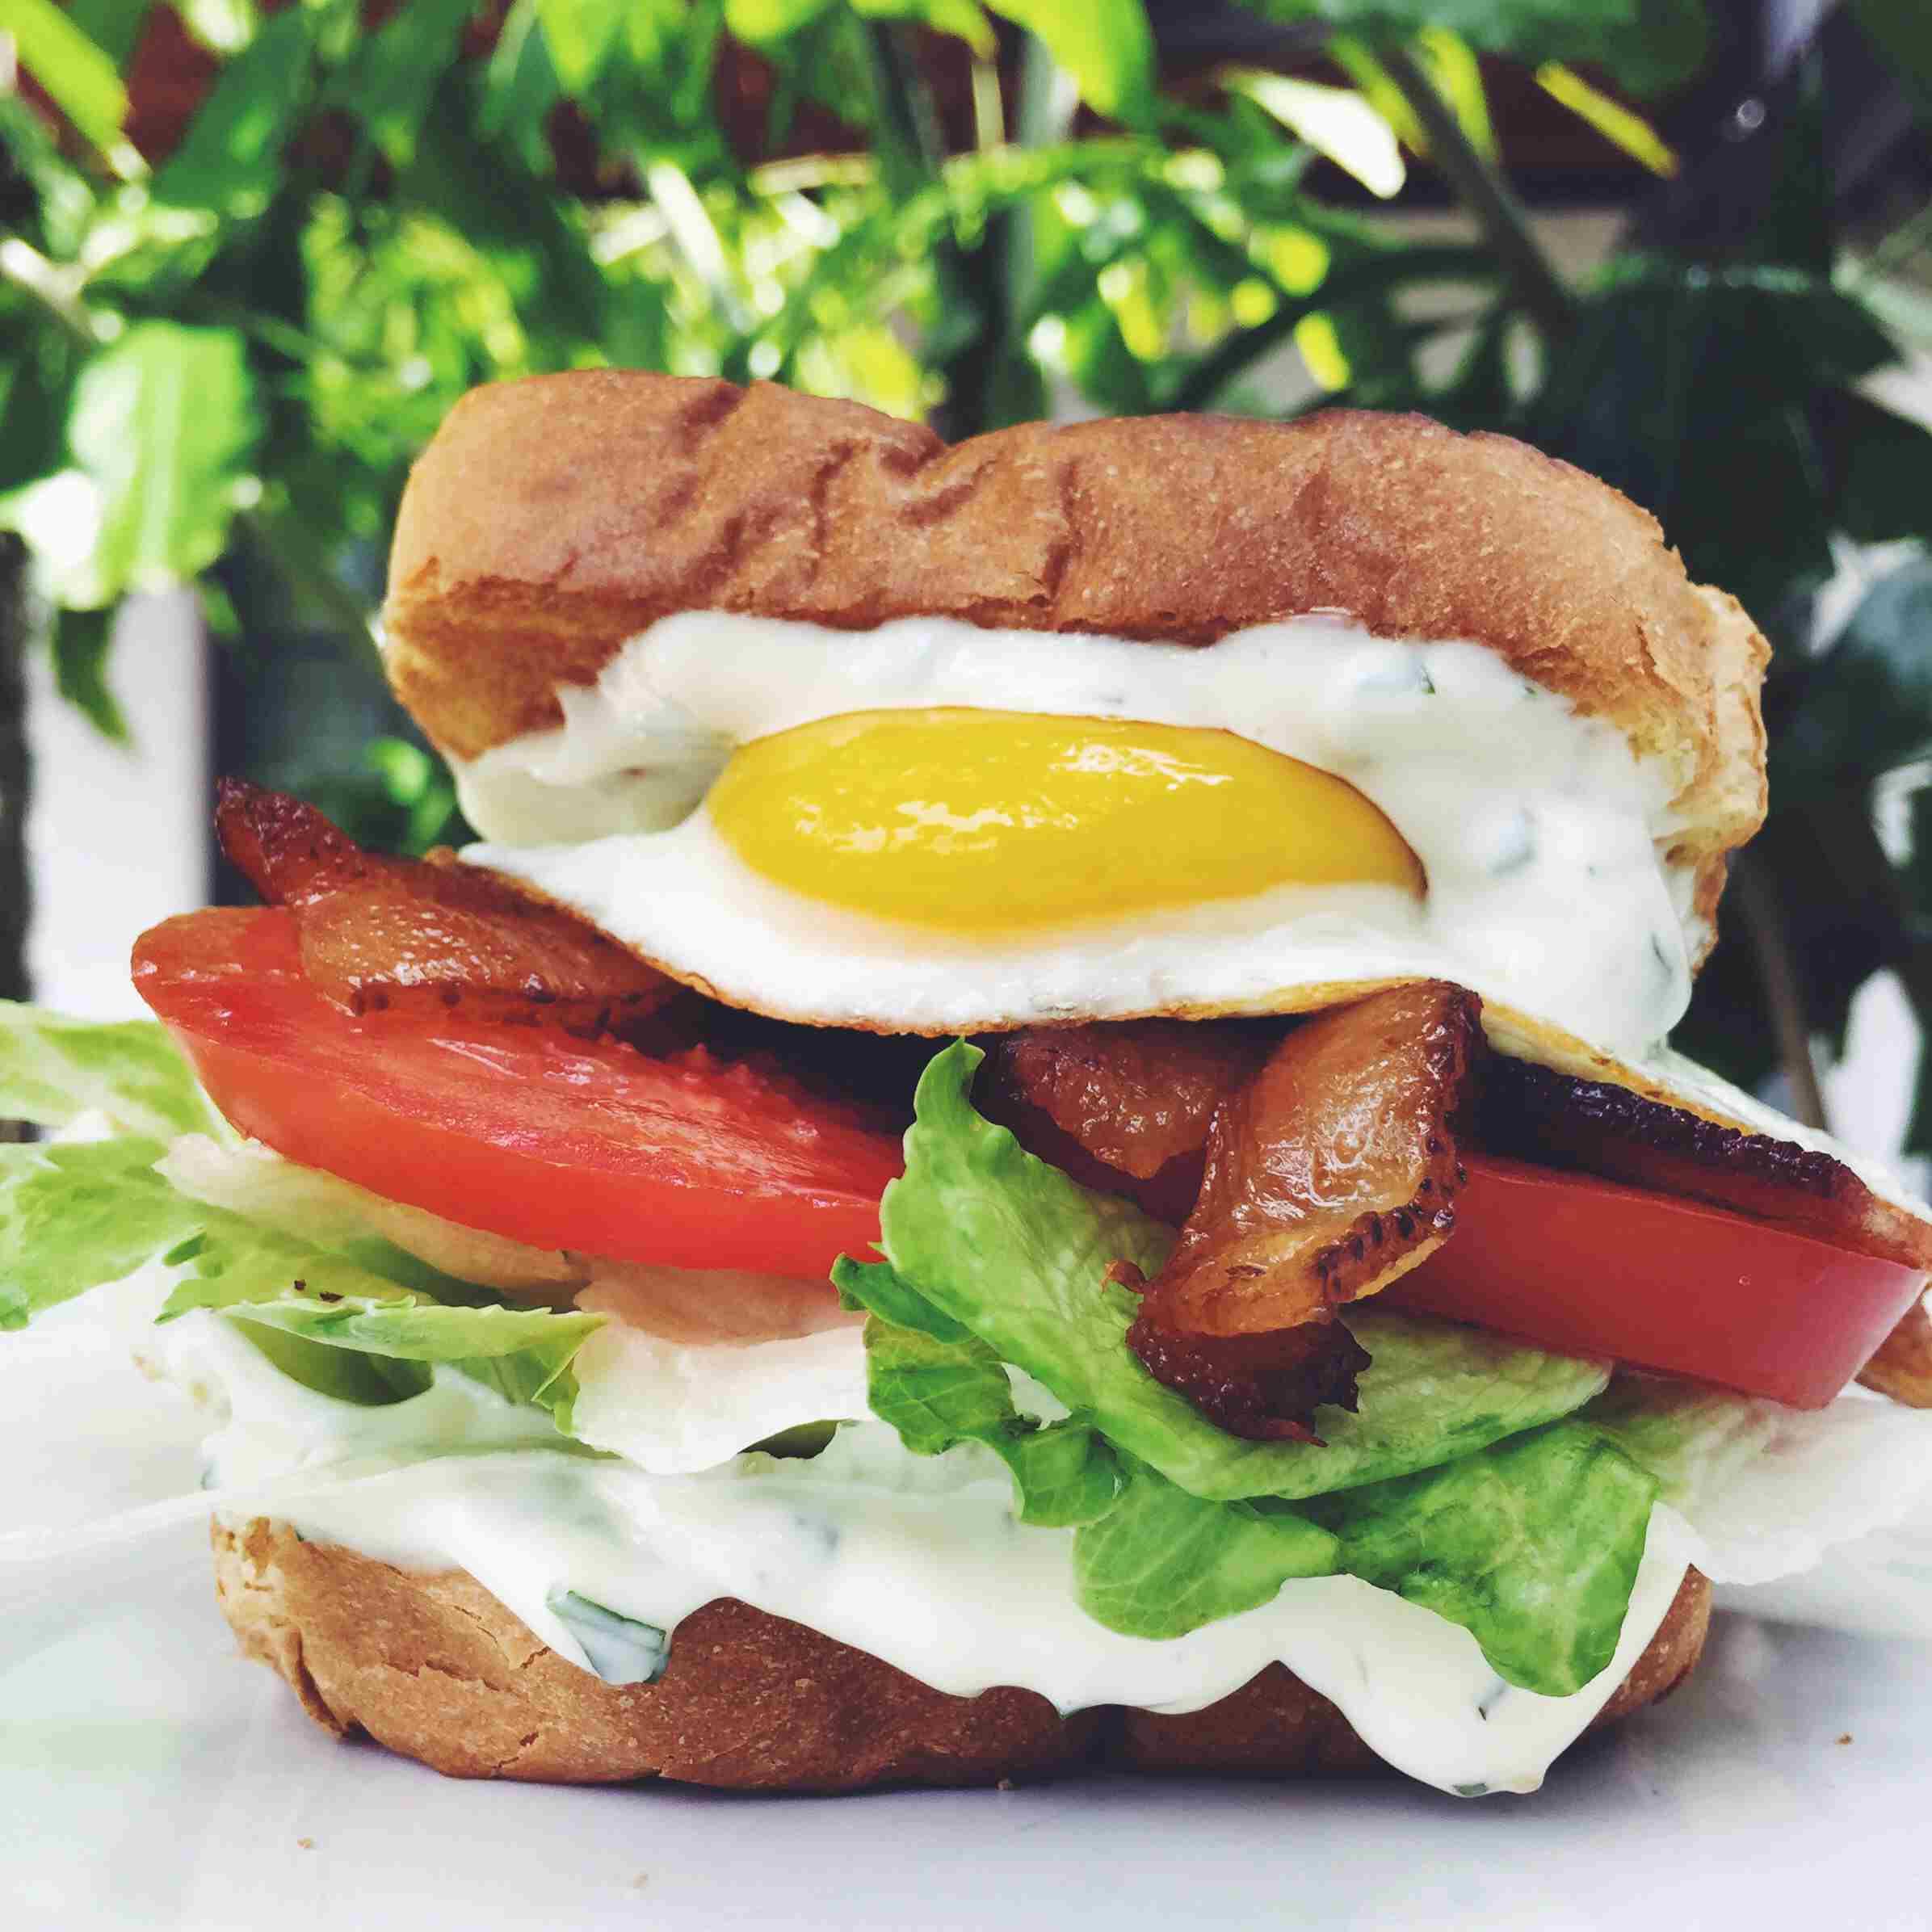 BLTE - Bacon, Lettuce, Tomato & Egg Sandwich